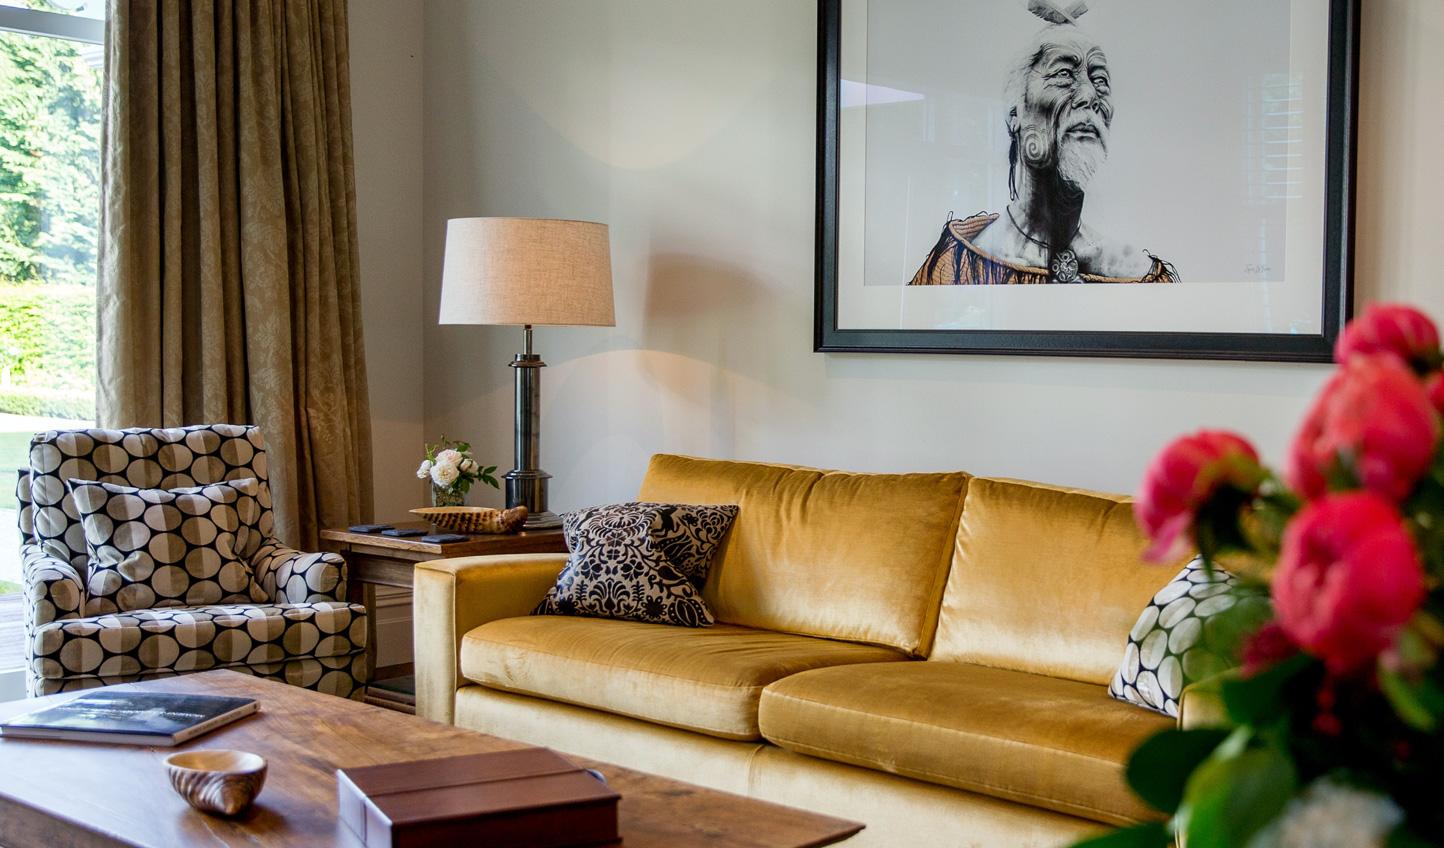 Chic and elegant decor at Marlborough Lodge